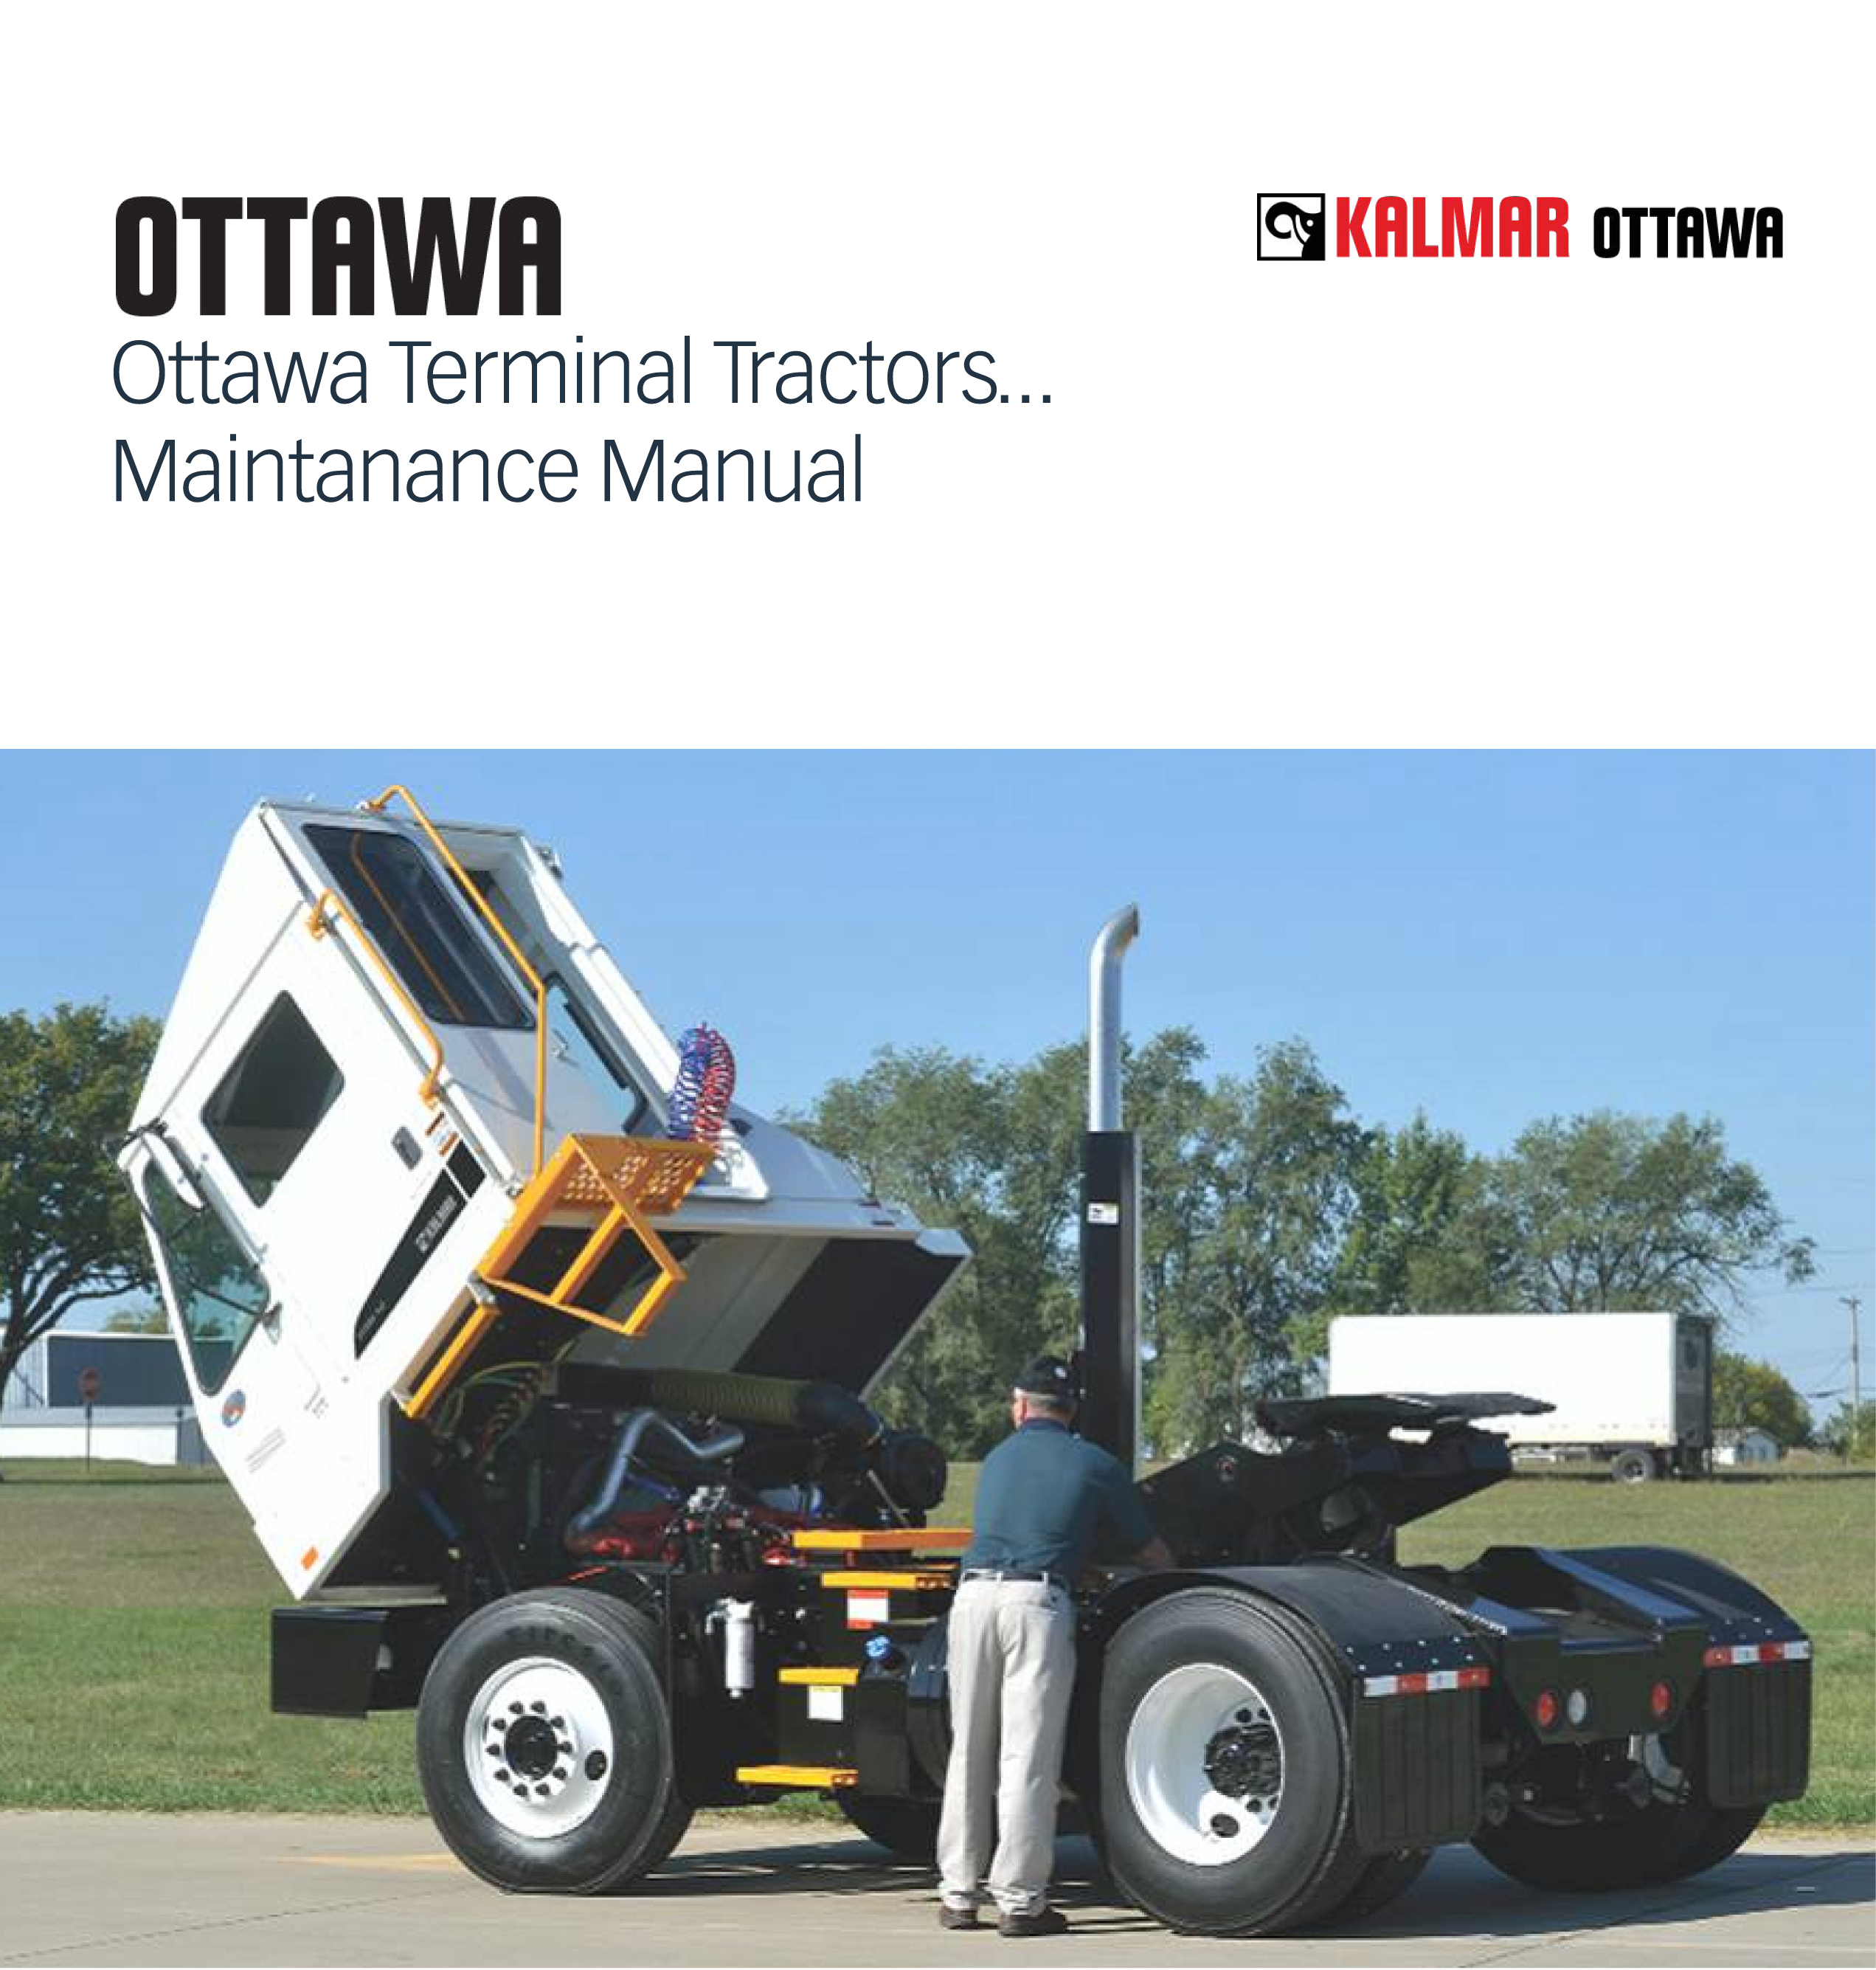 Download The Kalmar Ottawa Maintenance Manual Cummins Fire Engine Diagrams Free